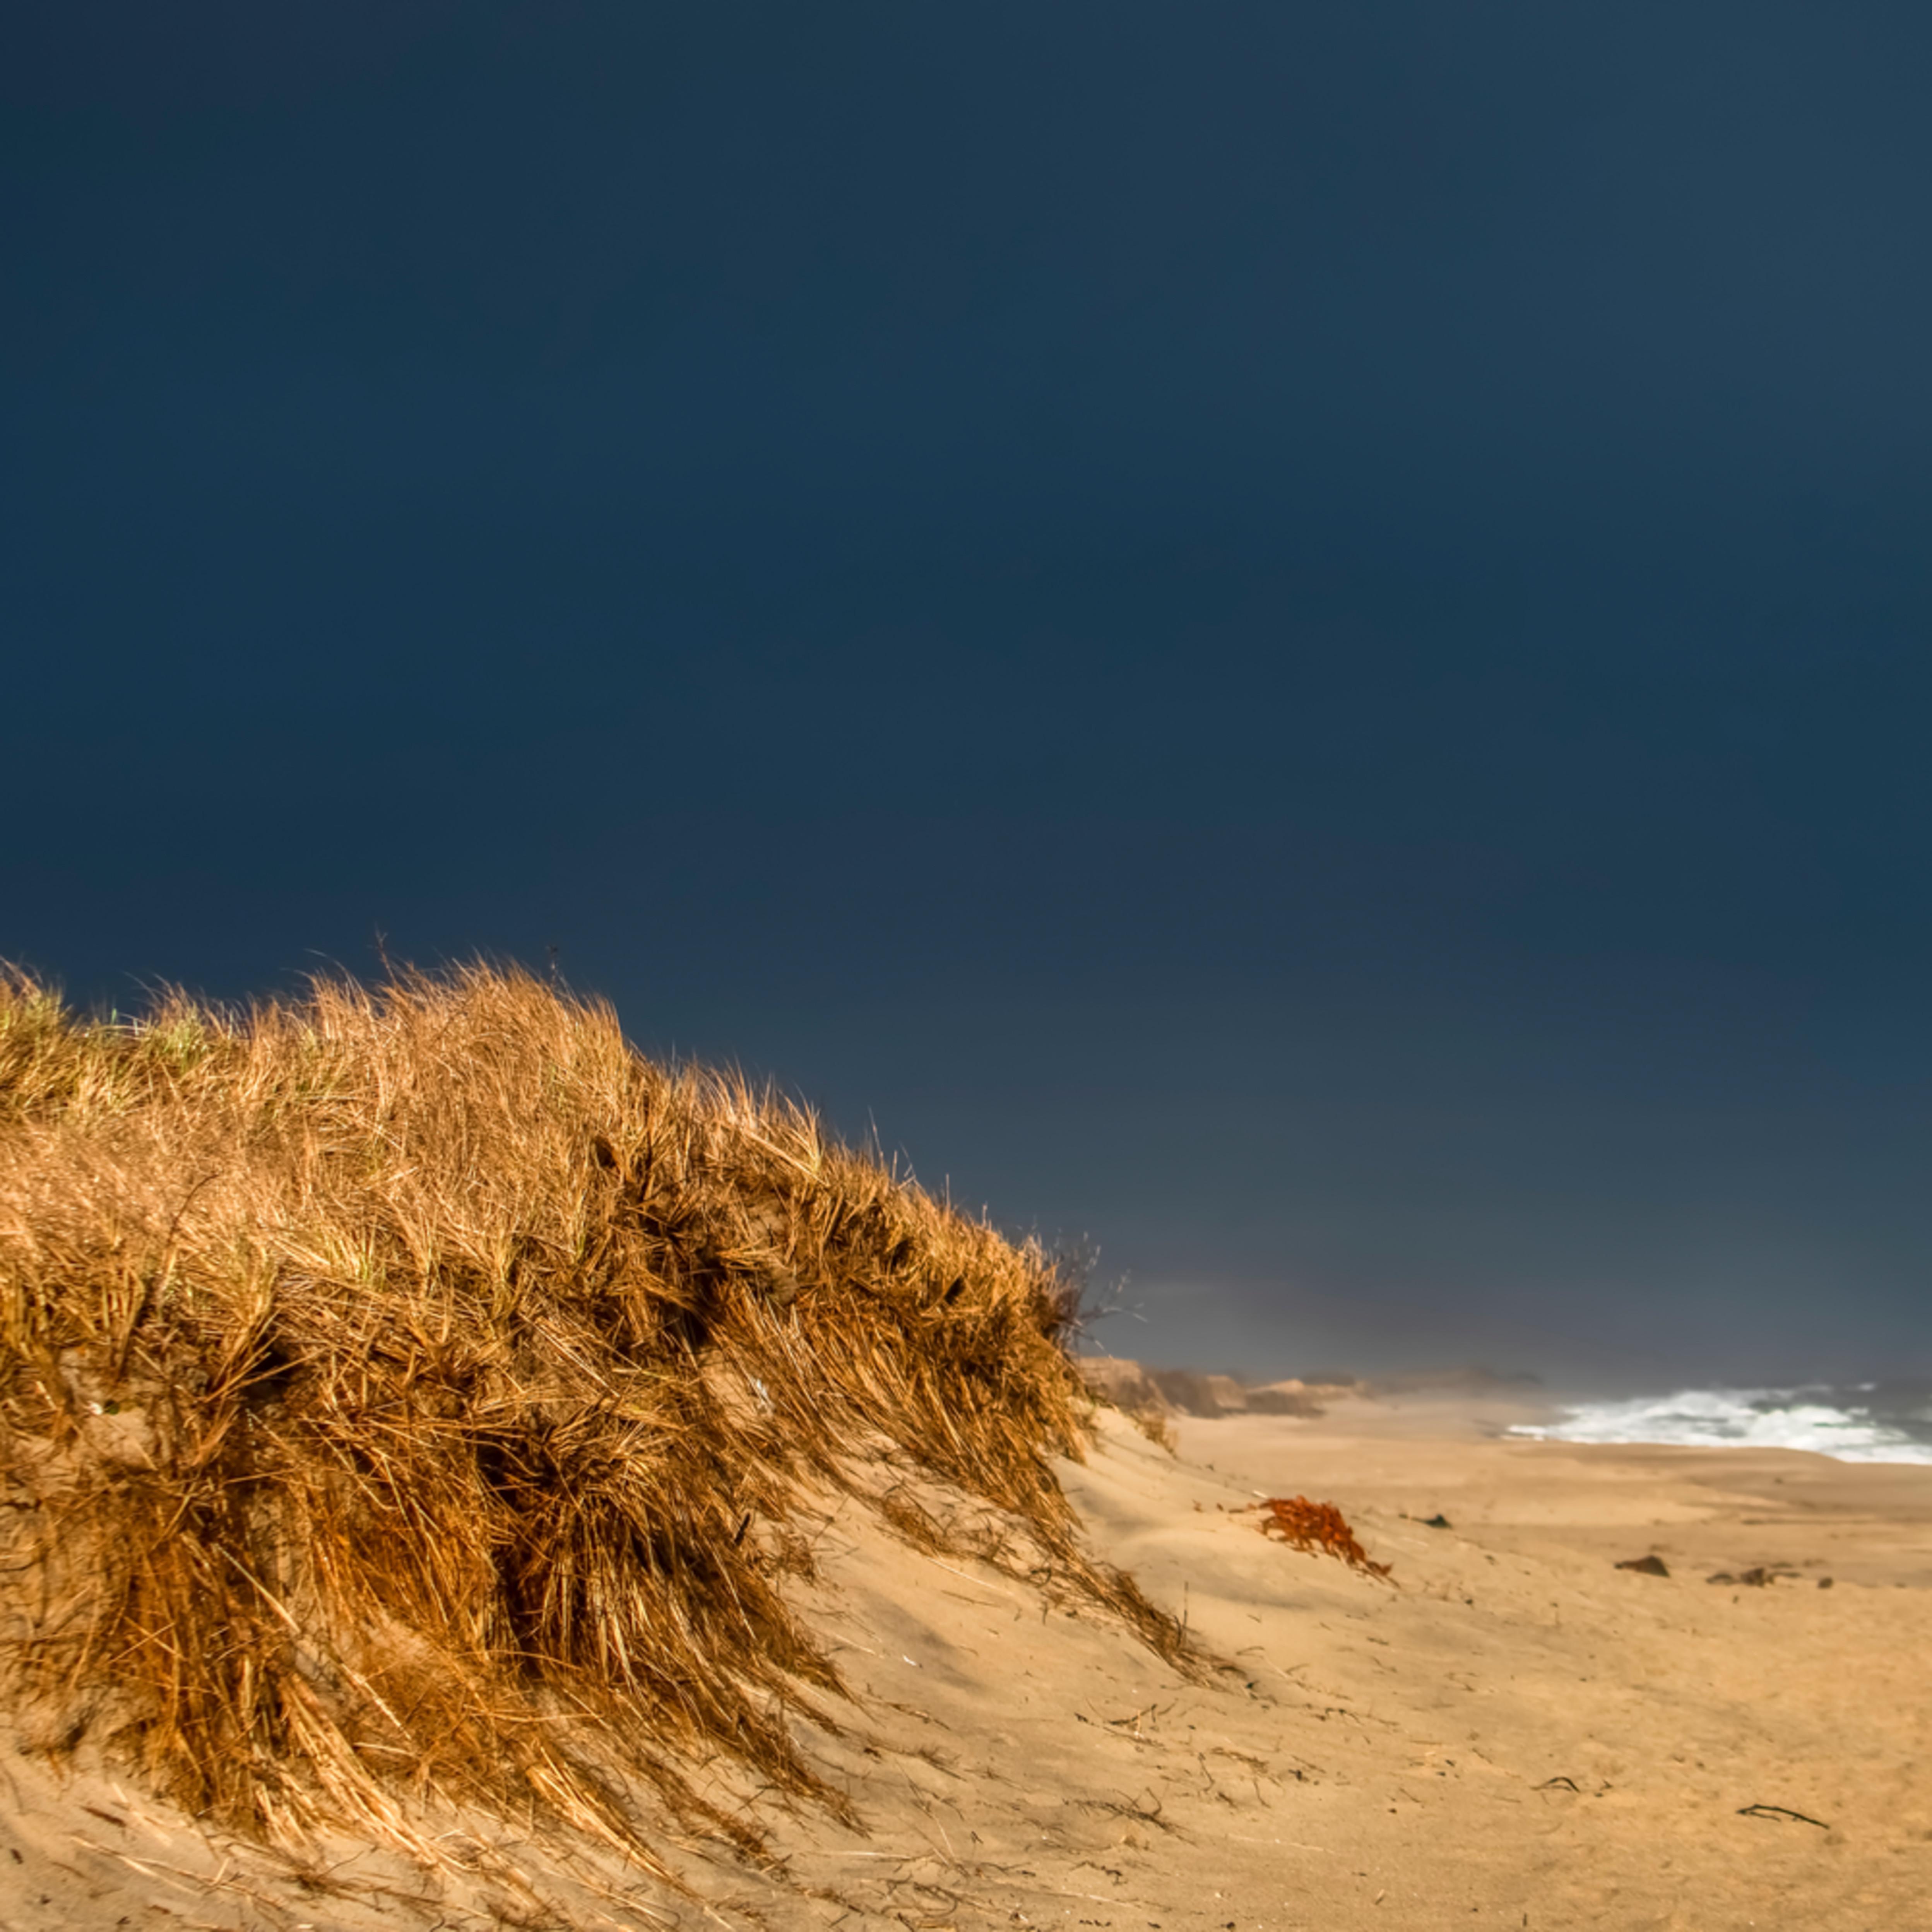 South beach storm sunlight copy hkdhqi